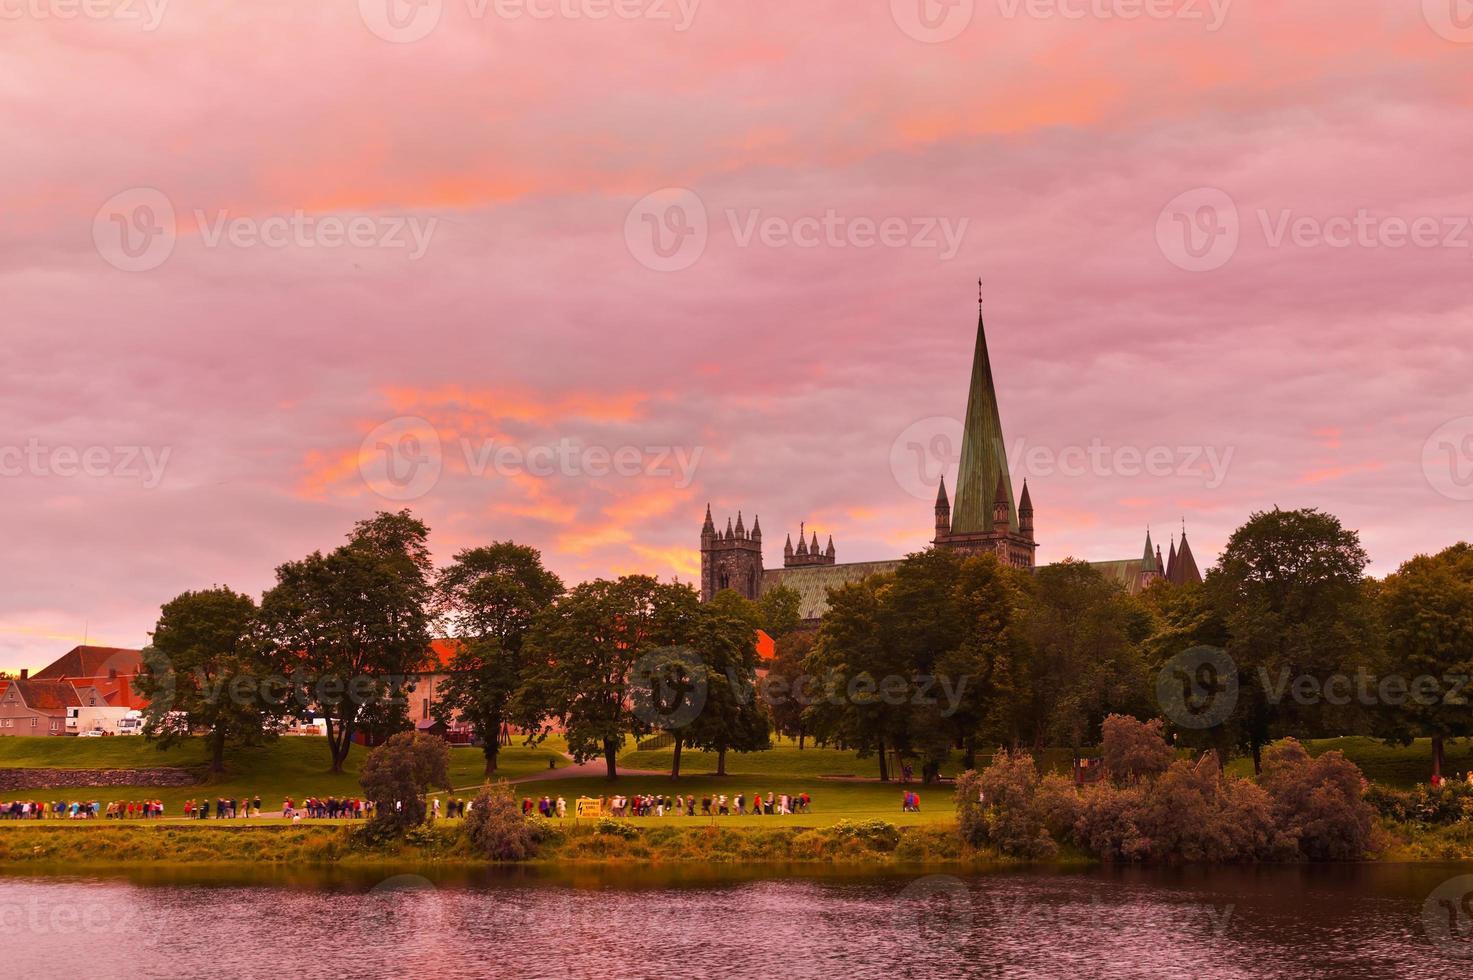 Kathedrale in Trondheim Norwegen bei Sonnenuntergang foto